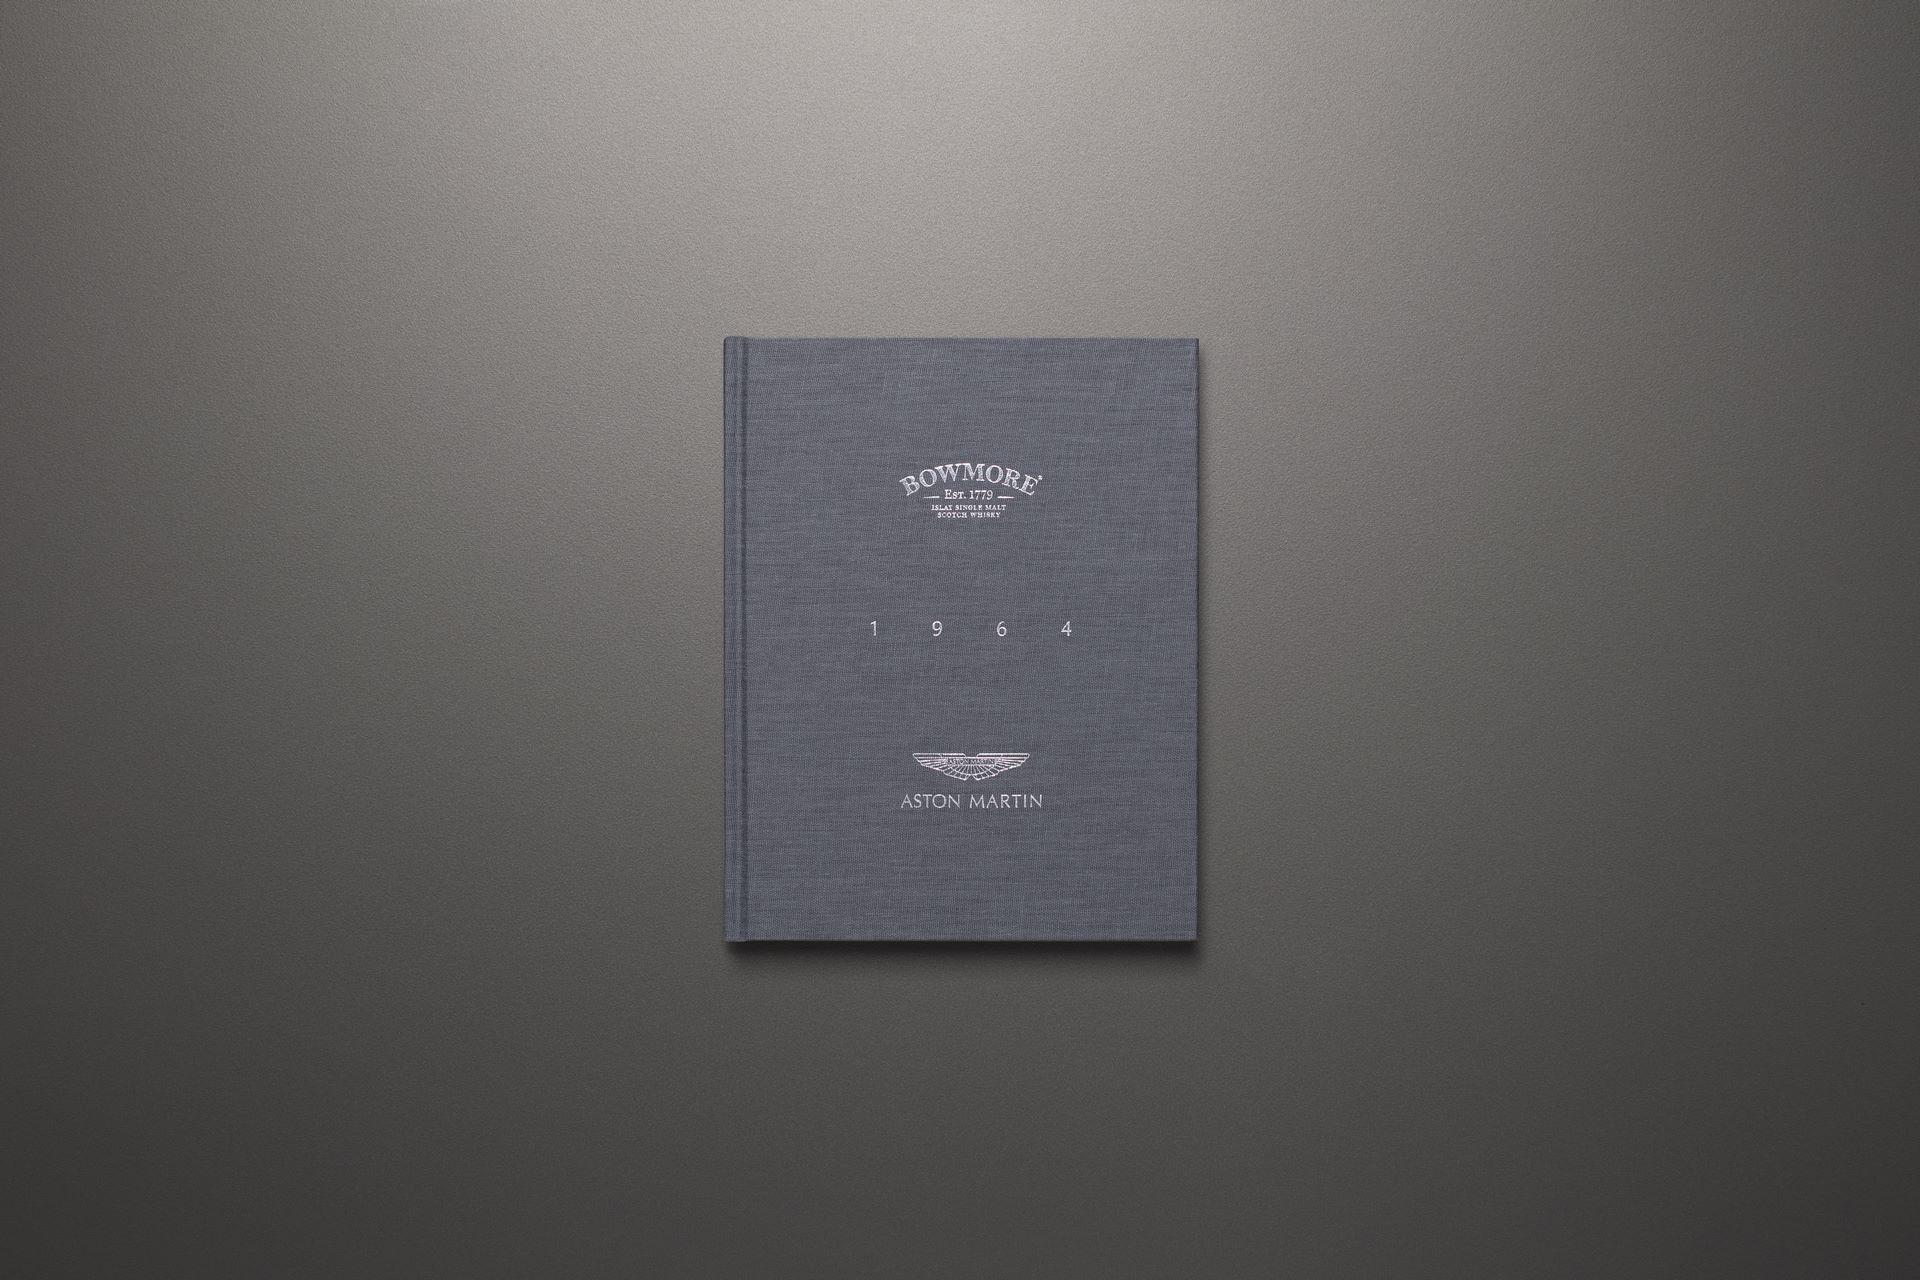 Black-Bowmore-Aston-Martin-DB5-1964-Whisky-9